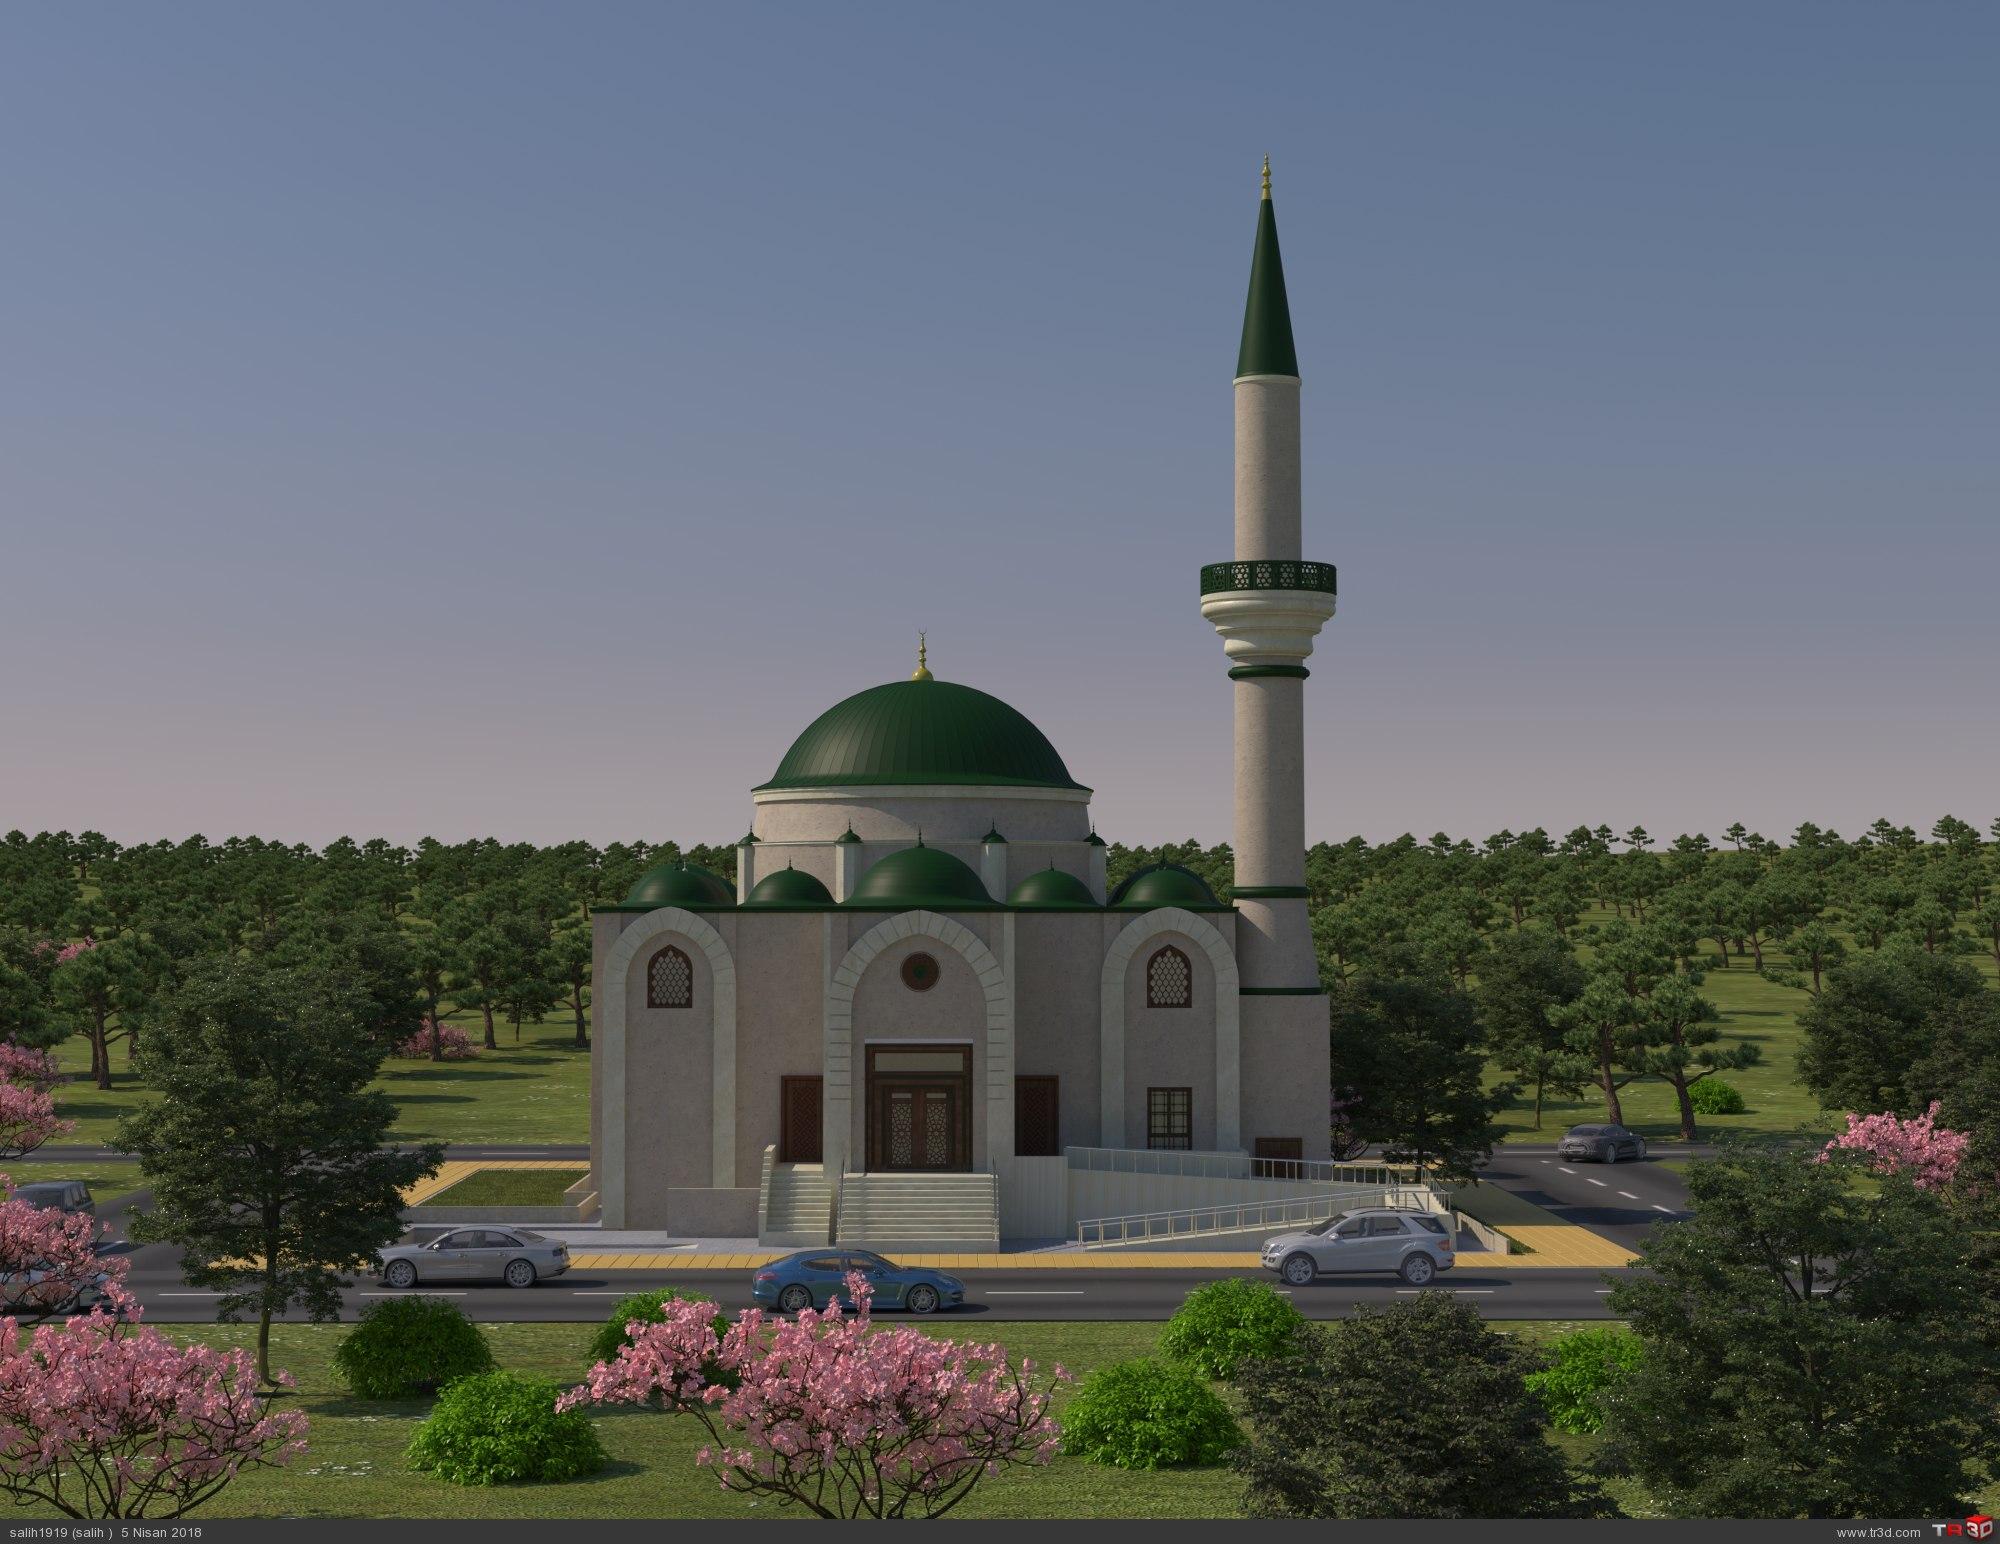 Bitlis İli Toplu Konut Adilcevaz Camii